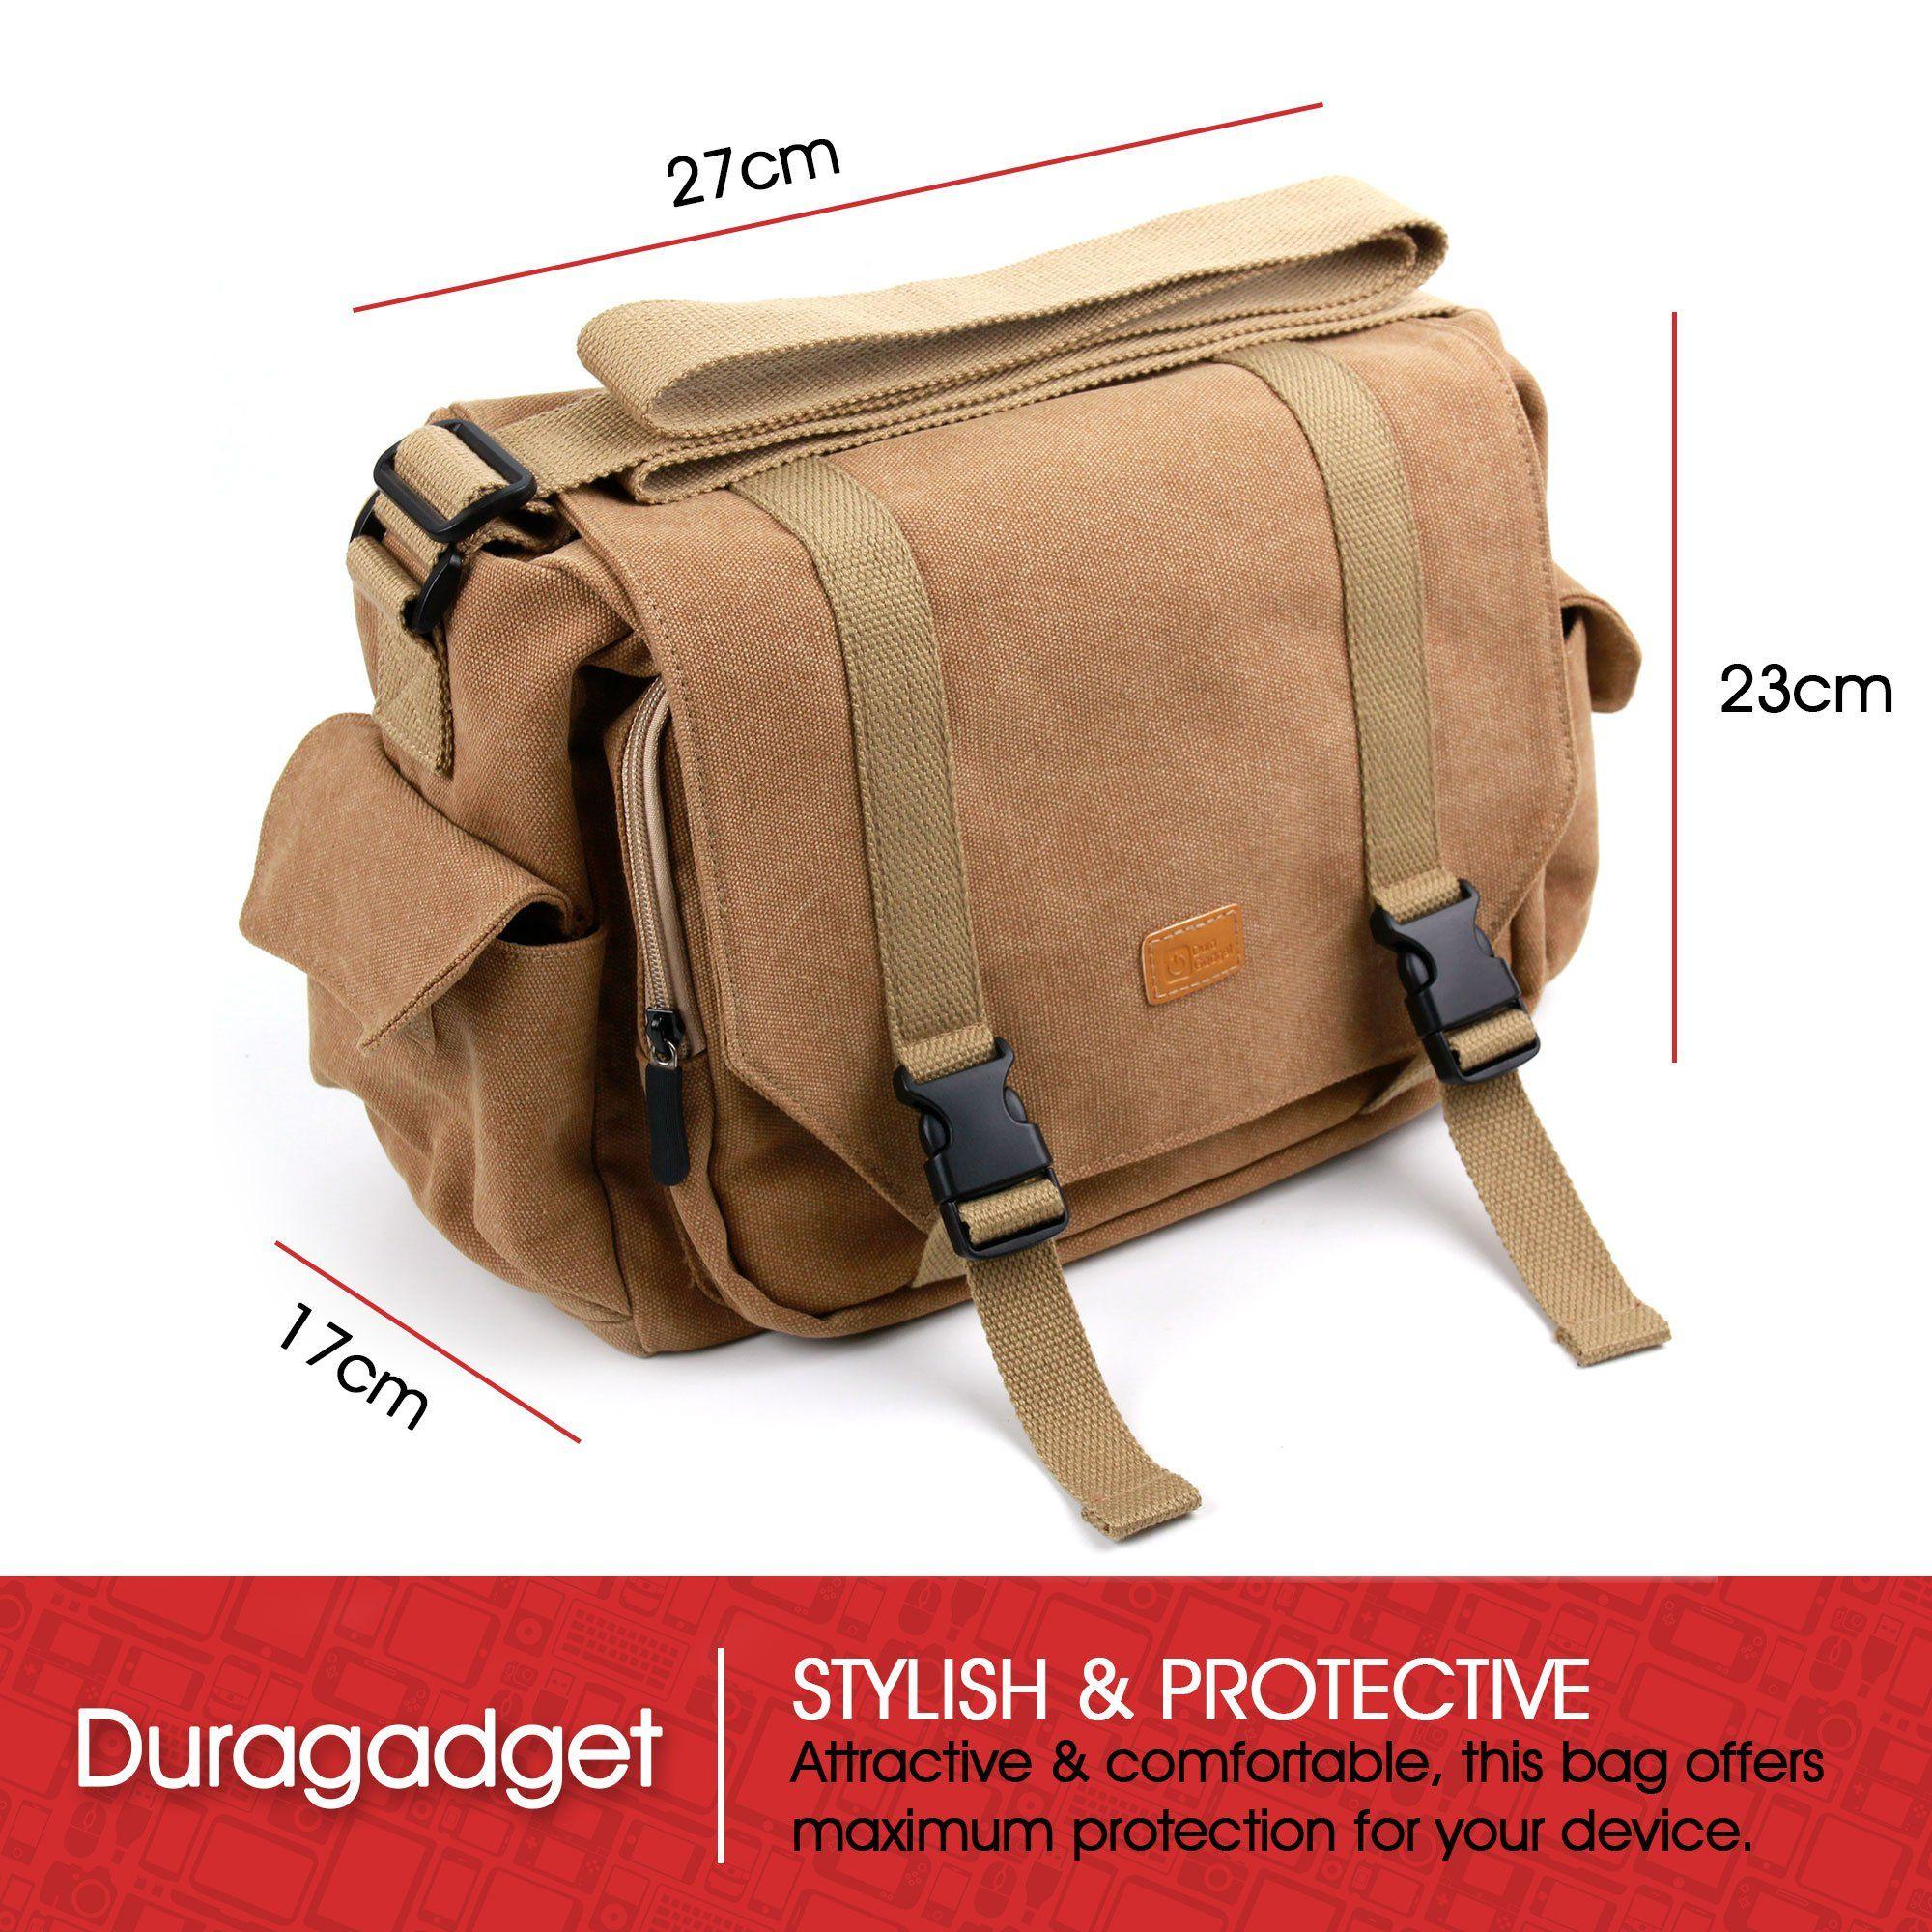 a41bf3ccab6f DURAGADGET Brown Canvas Carry Bag GoPro Hero6 Hero5 Hero 4 Black ...